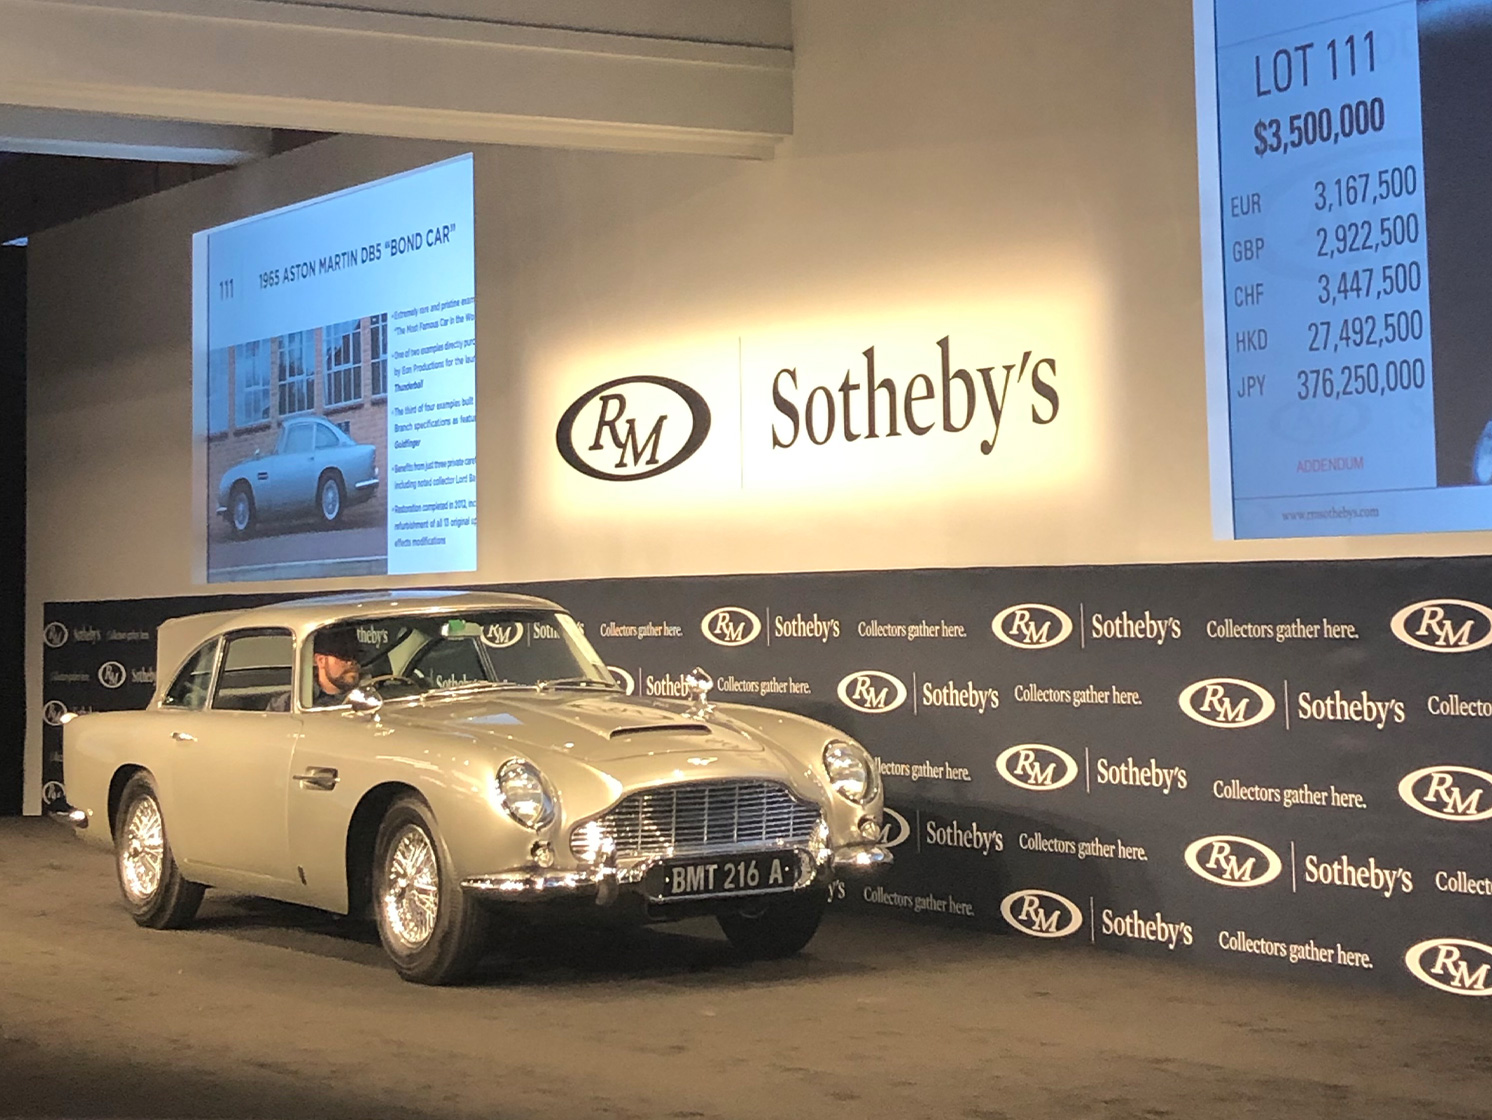 Bond Car at auction